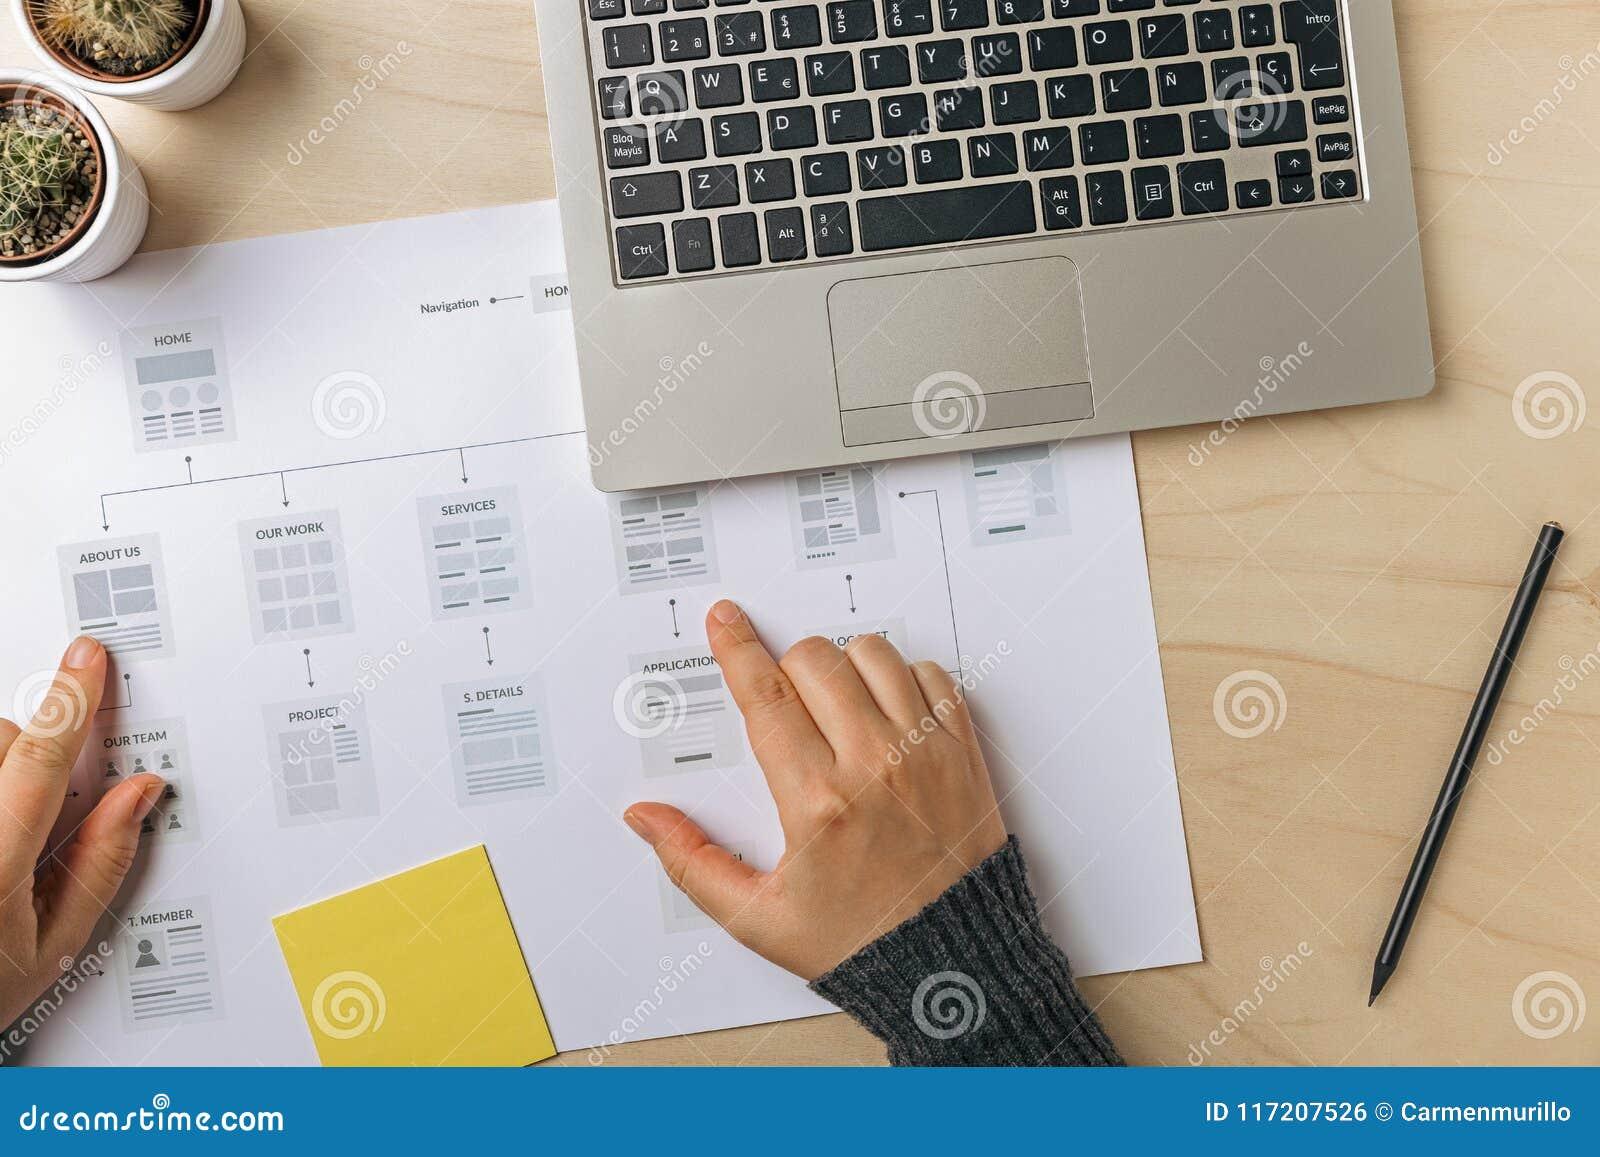 Web designer working on website sitemap